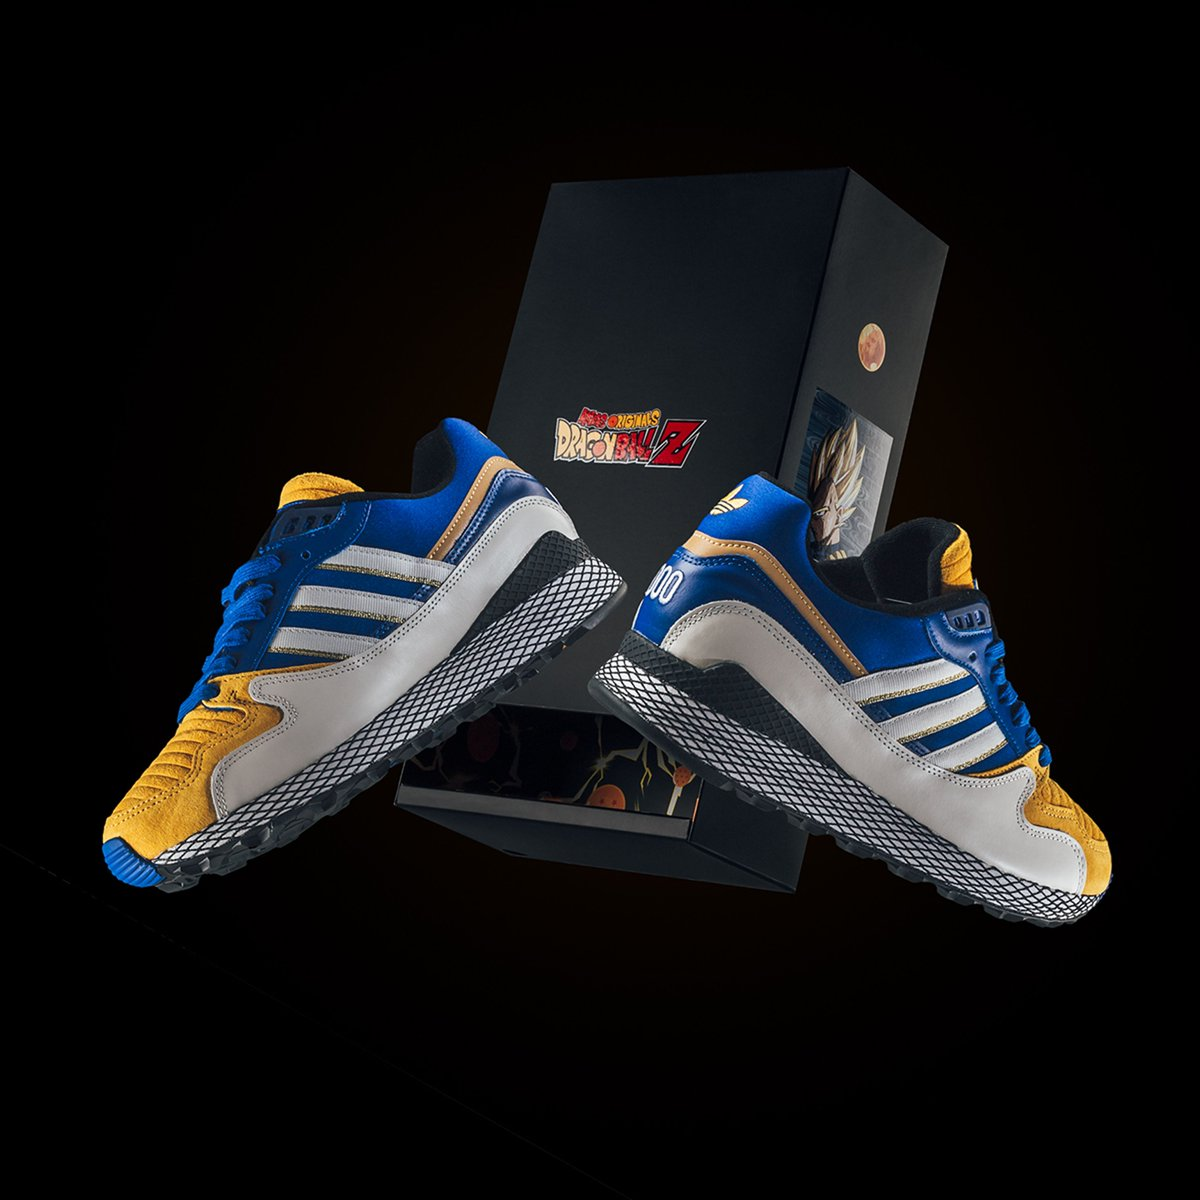 d97054 adidas- OFF 58% - www.butc.co.za!